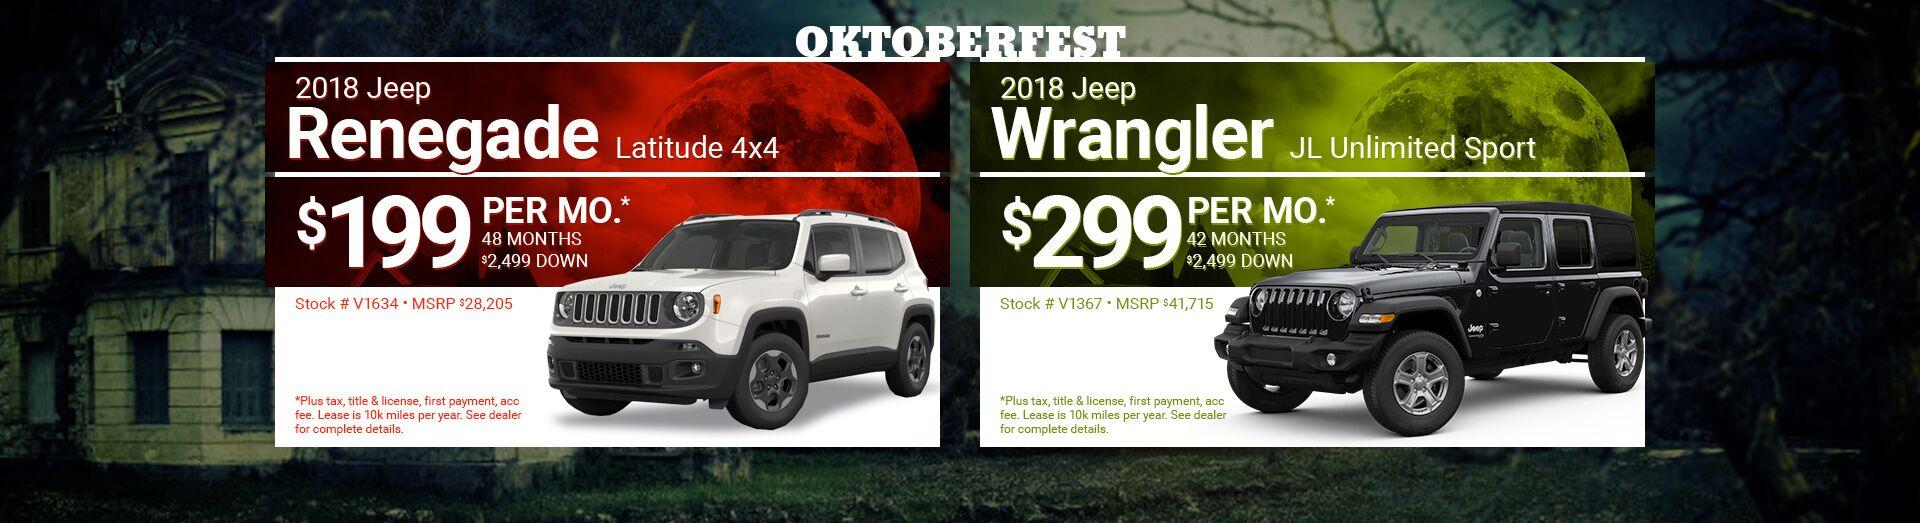 Land Rover Dealership Mn >> Chrysler Dodge Jeep RAM Dealership Stillwater MN | Used Cars Fury Jeep Stillwater